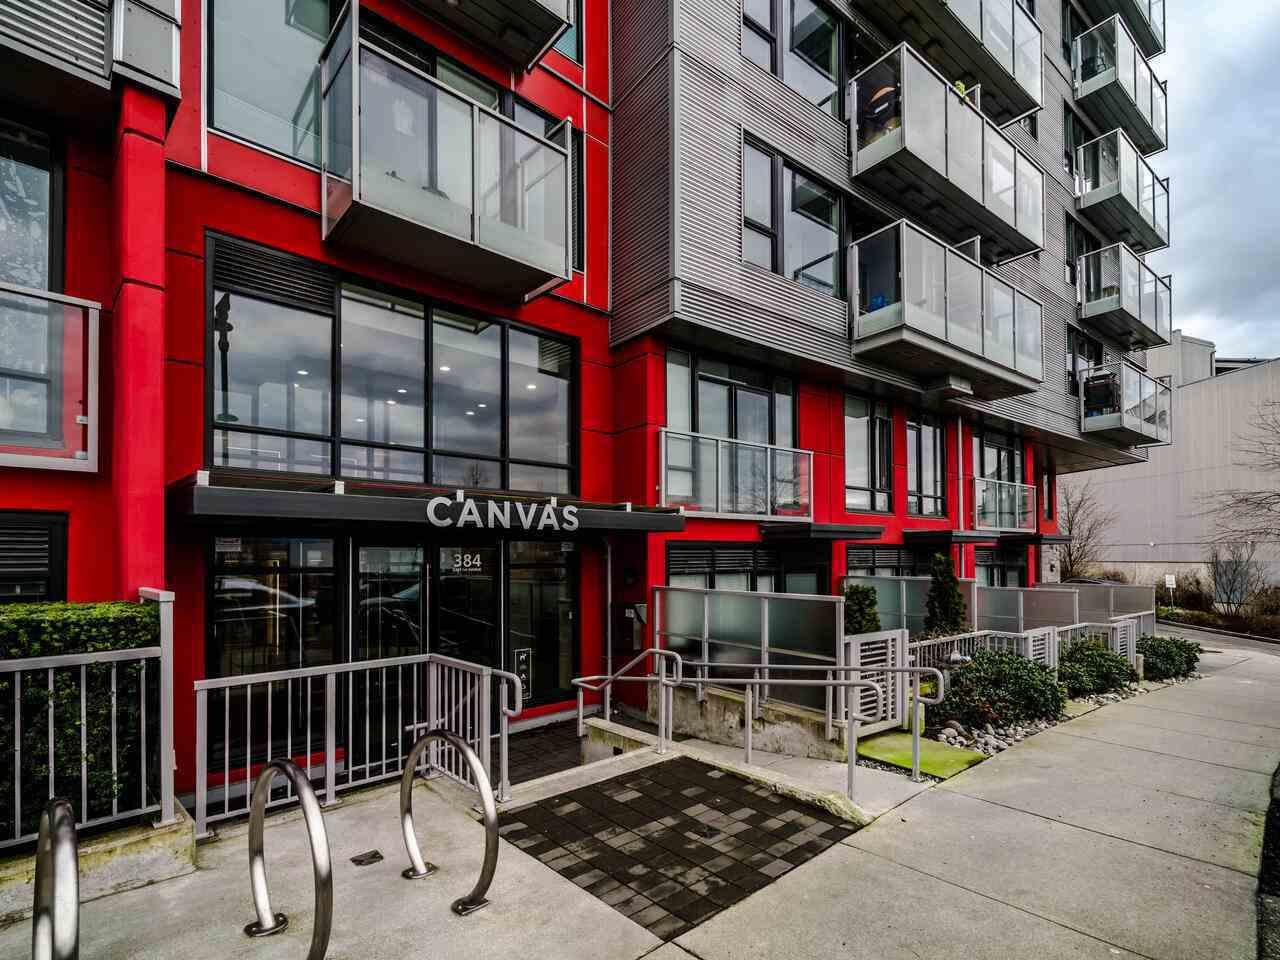 384-e-1st-avenue-strathcona-vancouver-east-19 at 318 - 384 E 1st Avenue, Strathcona, Vancouver East